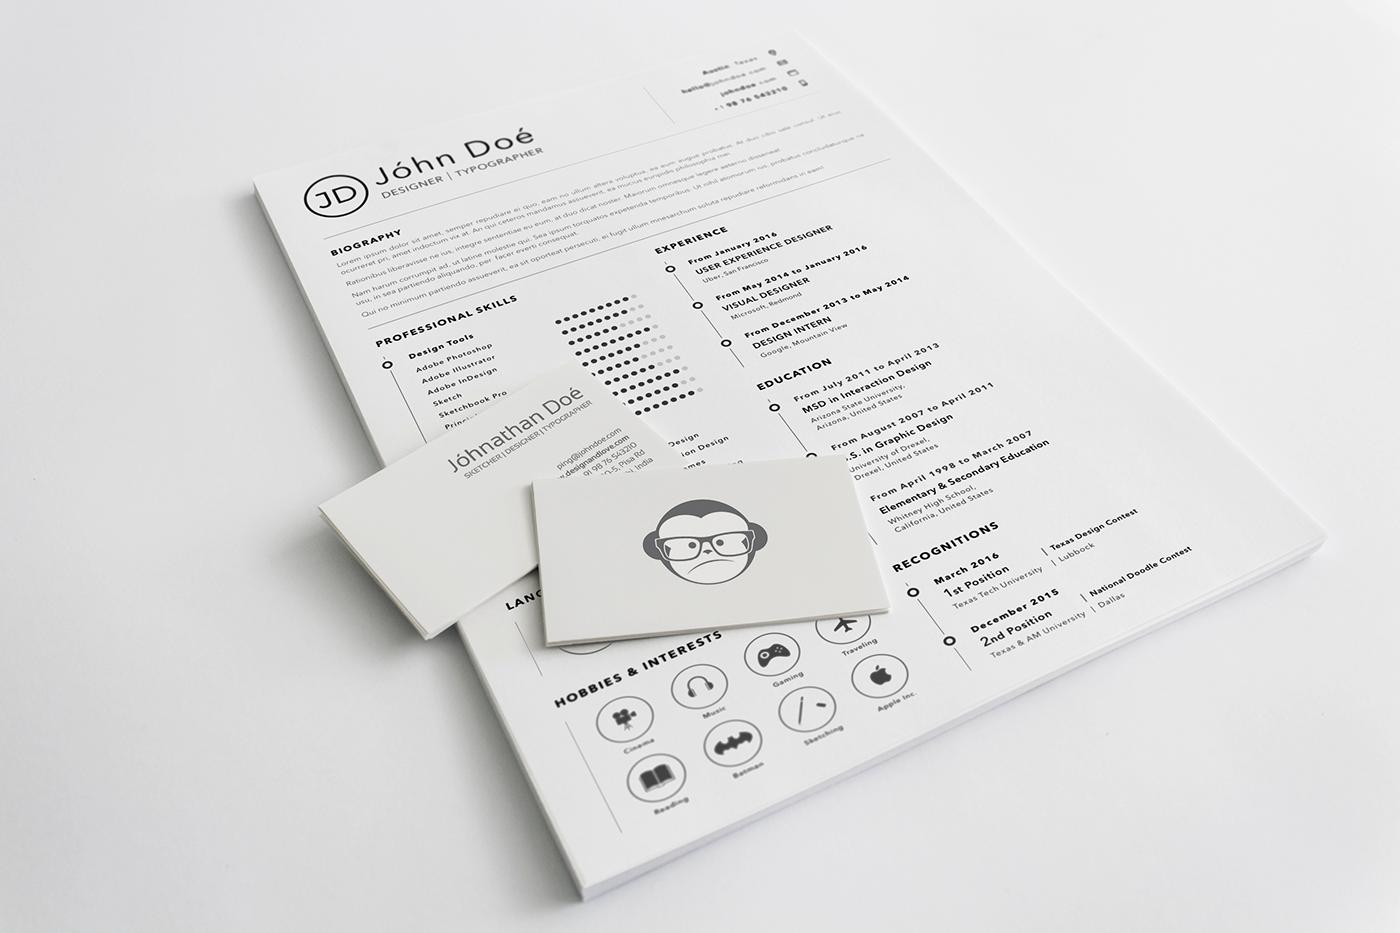 Resume free freebie sketch resource CV download template Mockup job